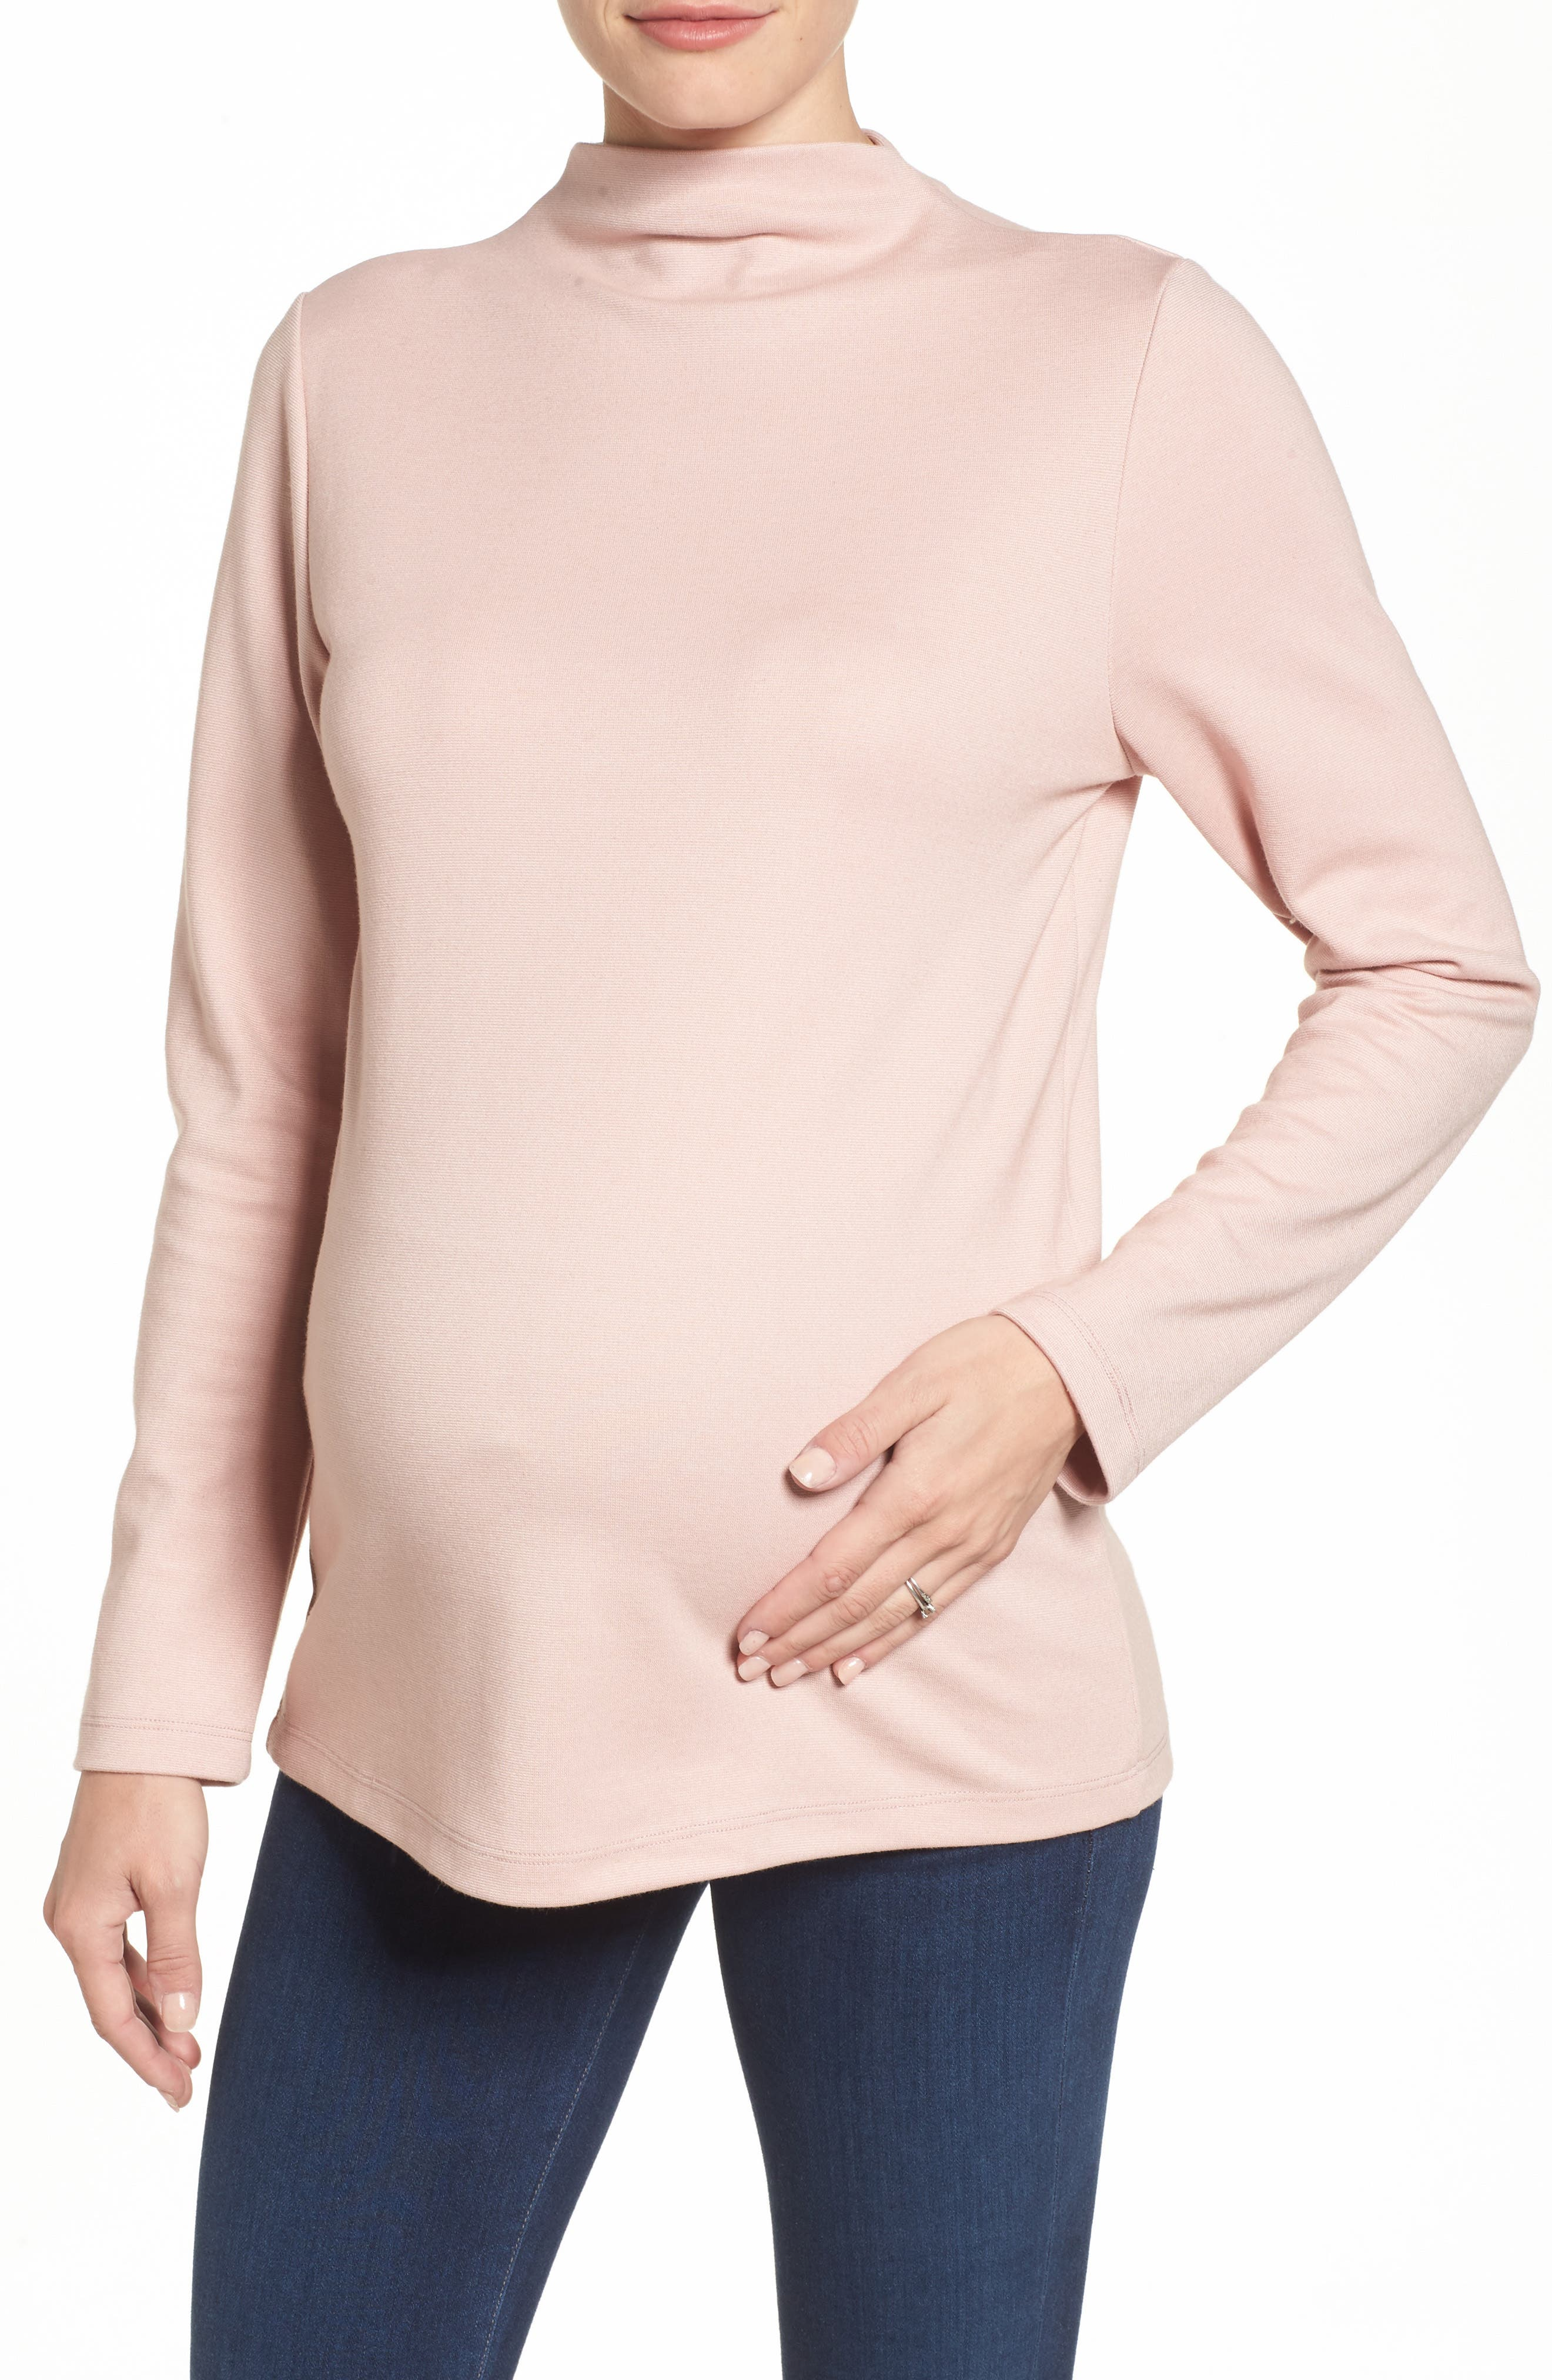 Leah Maternity Top,                         Main,                         color, BLUSH